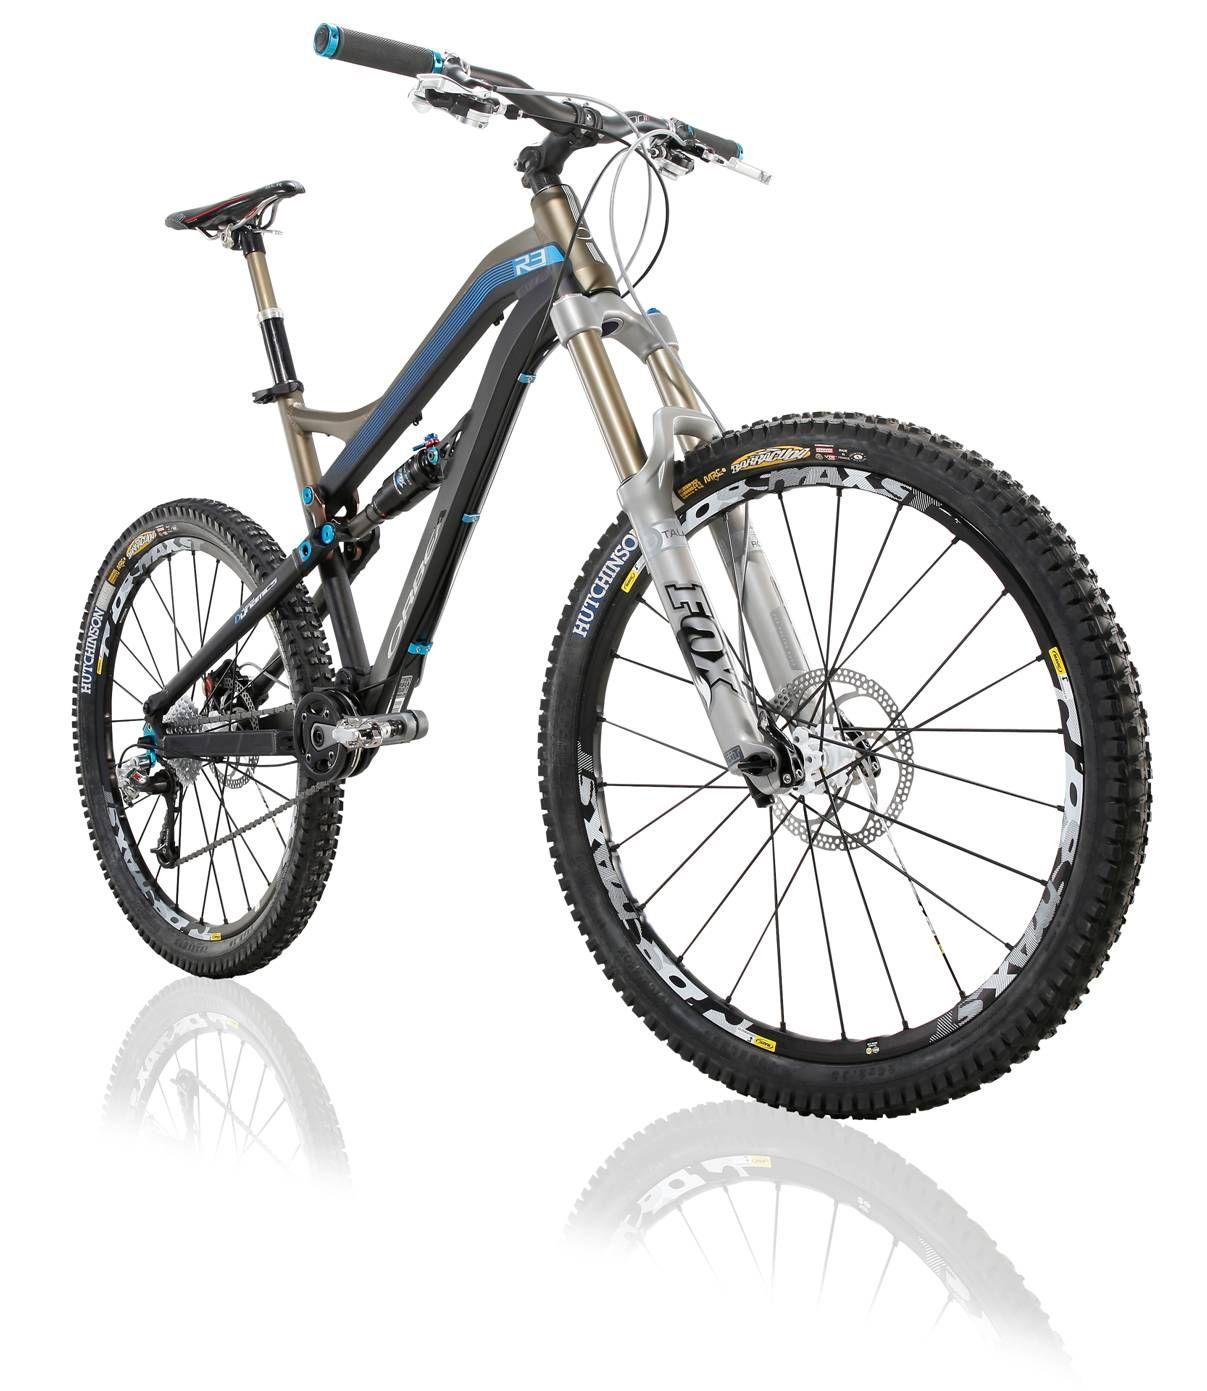 Google Image Result for http://www.bikelab.com.au/assets/0000/1882/2010-orbea-rallon-all-mountain-bike3.jpeg